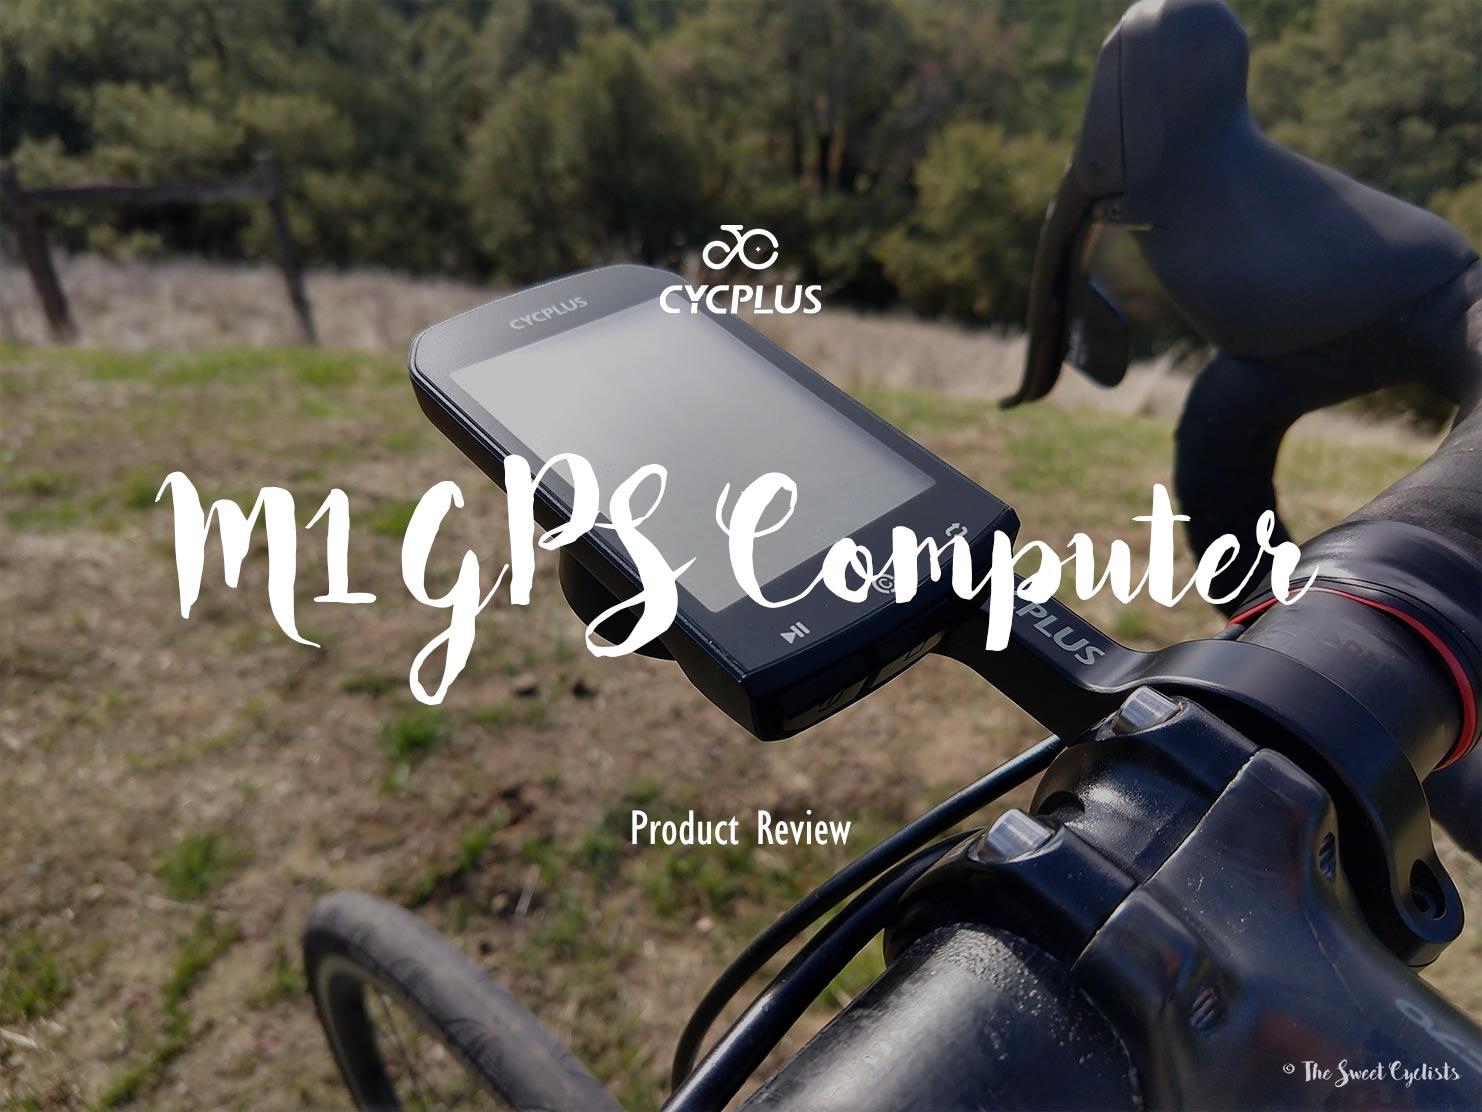 CYCPLUS M1, a $50 GPS Cycling Computer